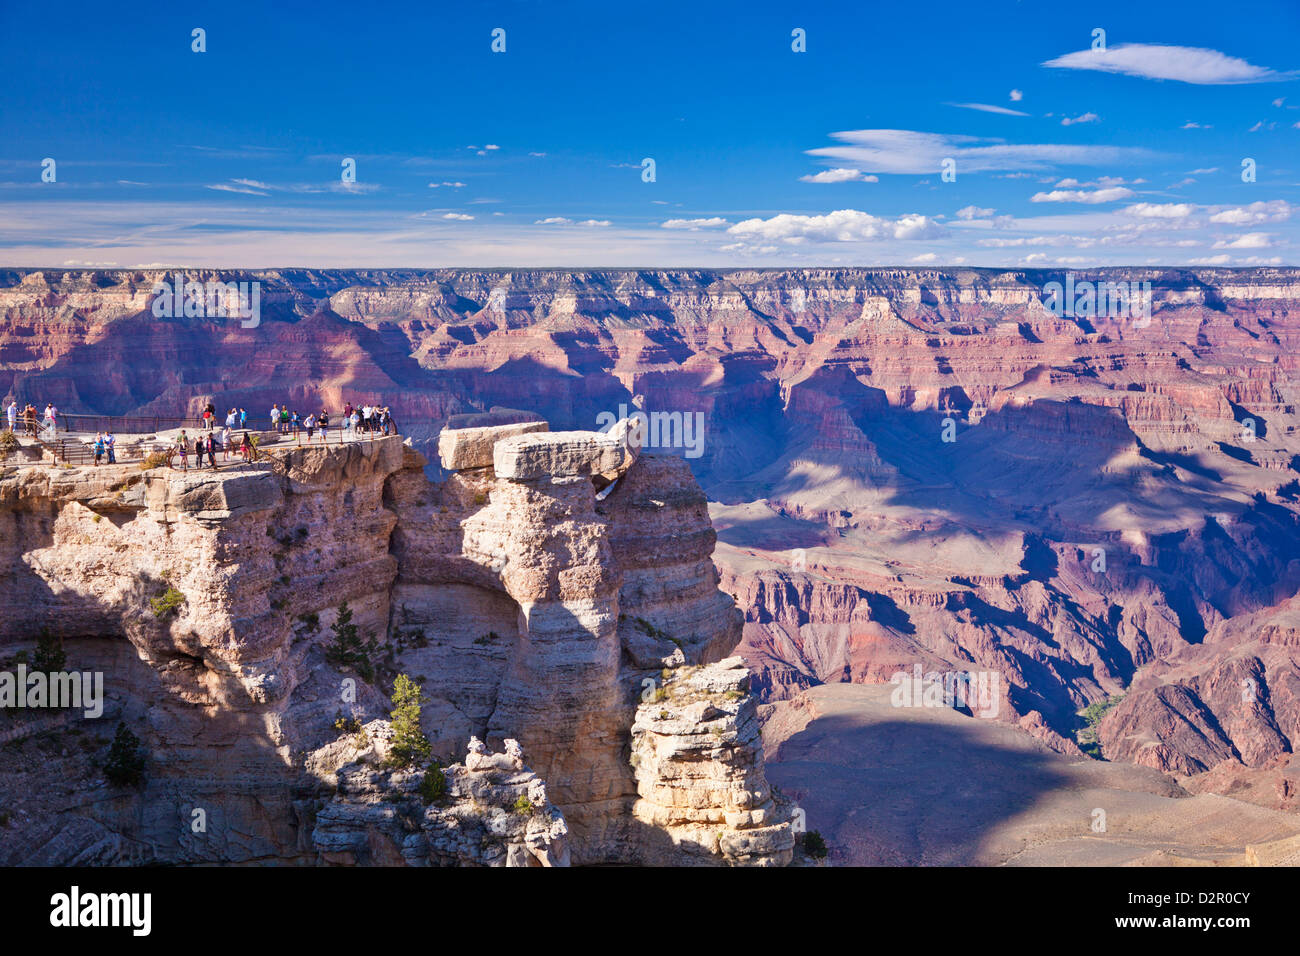 Tourists at Mather Point overlook, South Rim, Grand Canyon National Park, Arizona, USA Stock Photo